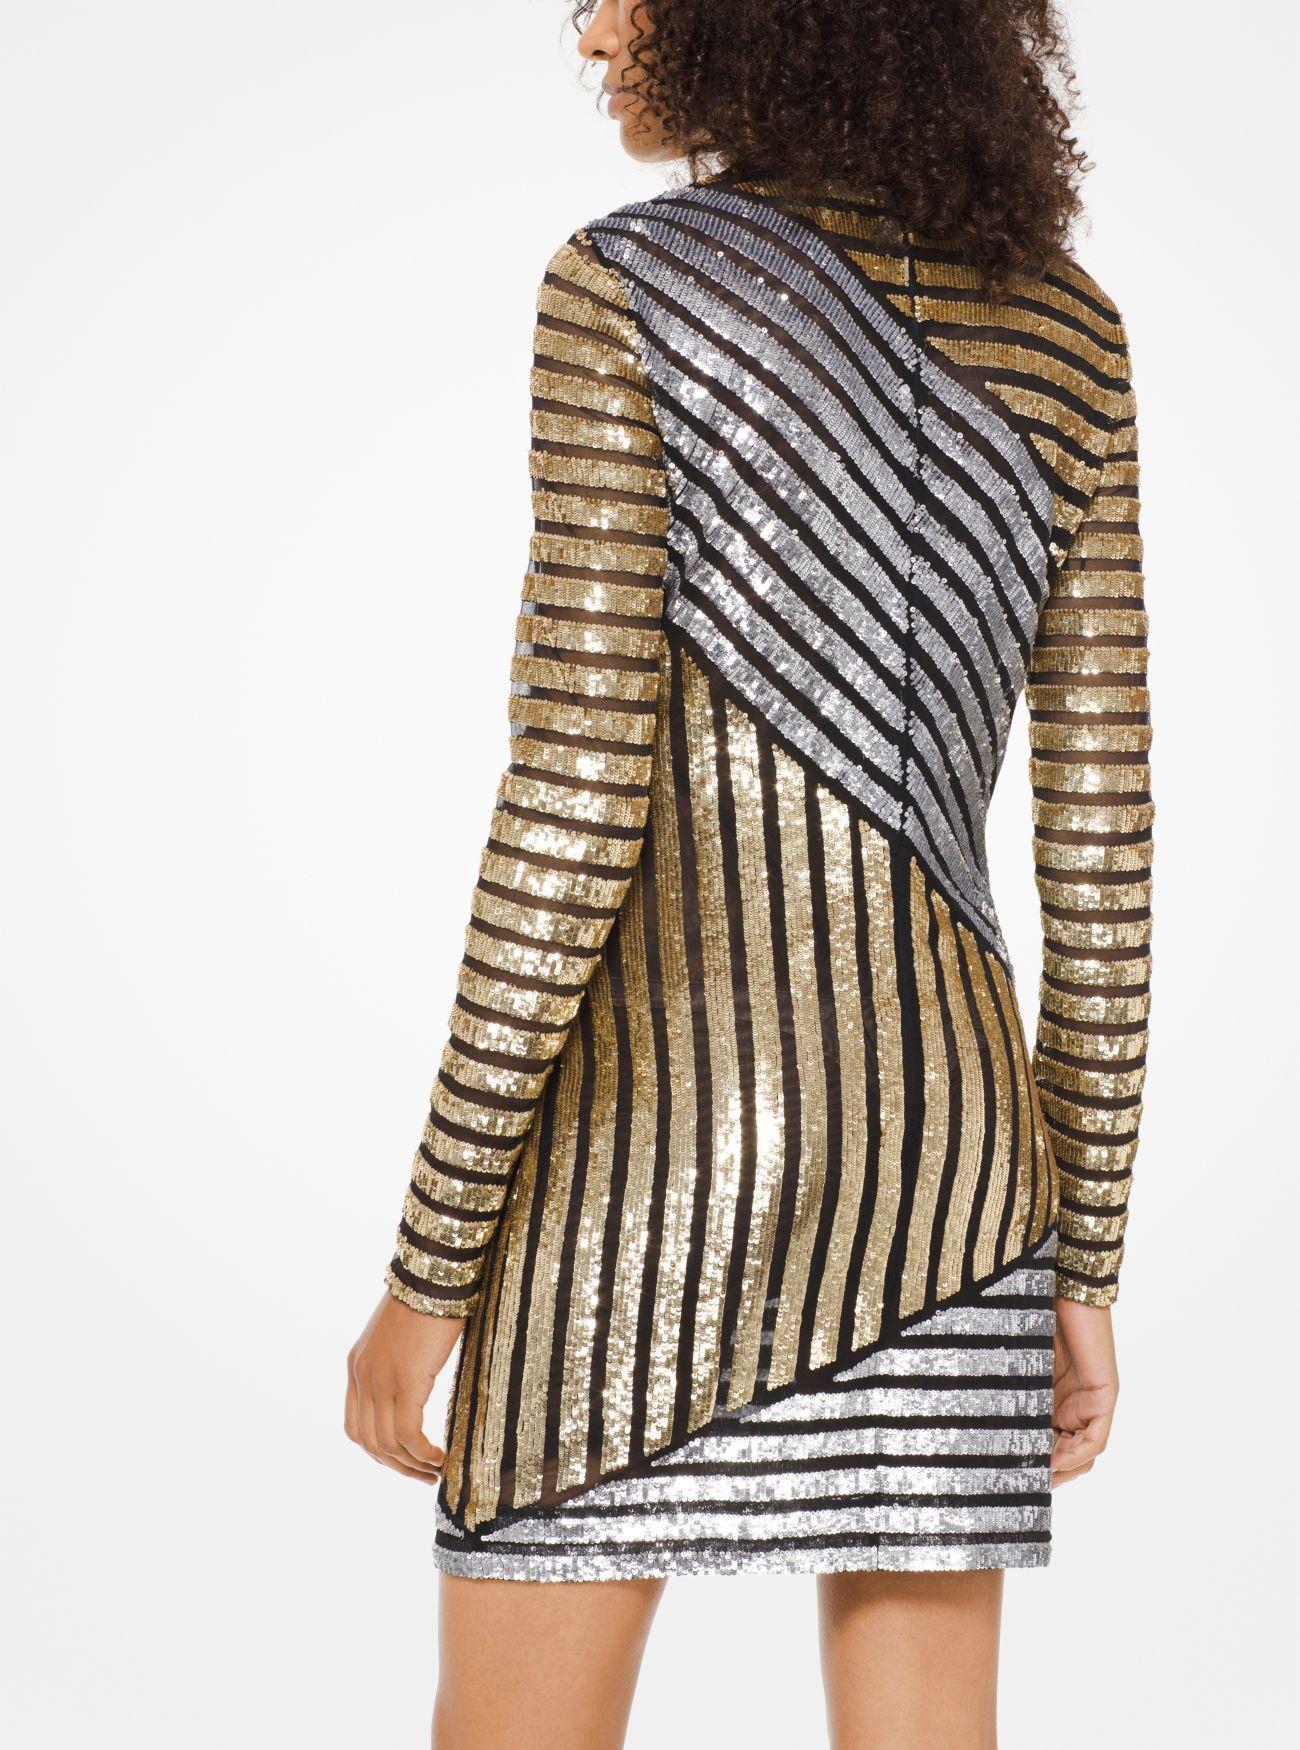 a370c665d71 Michael Kors - Black Stripe Sequined T-shirt Dress - Lyst. View fullscreen